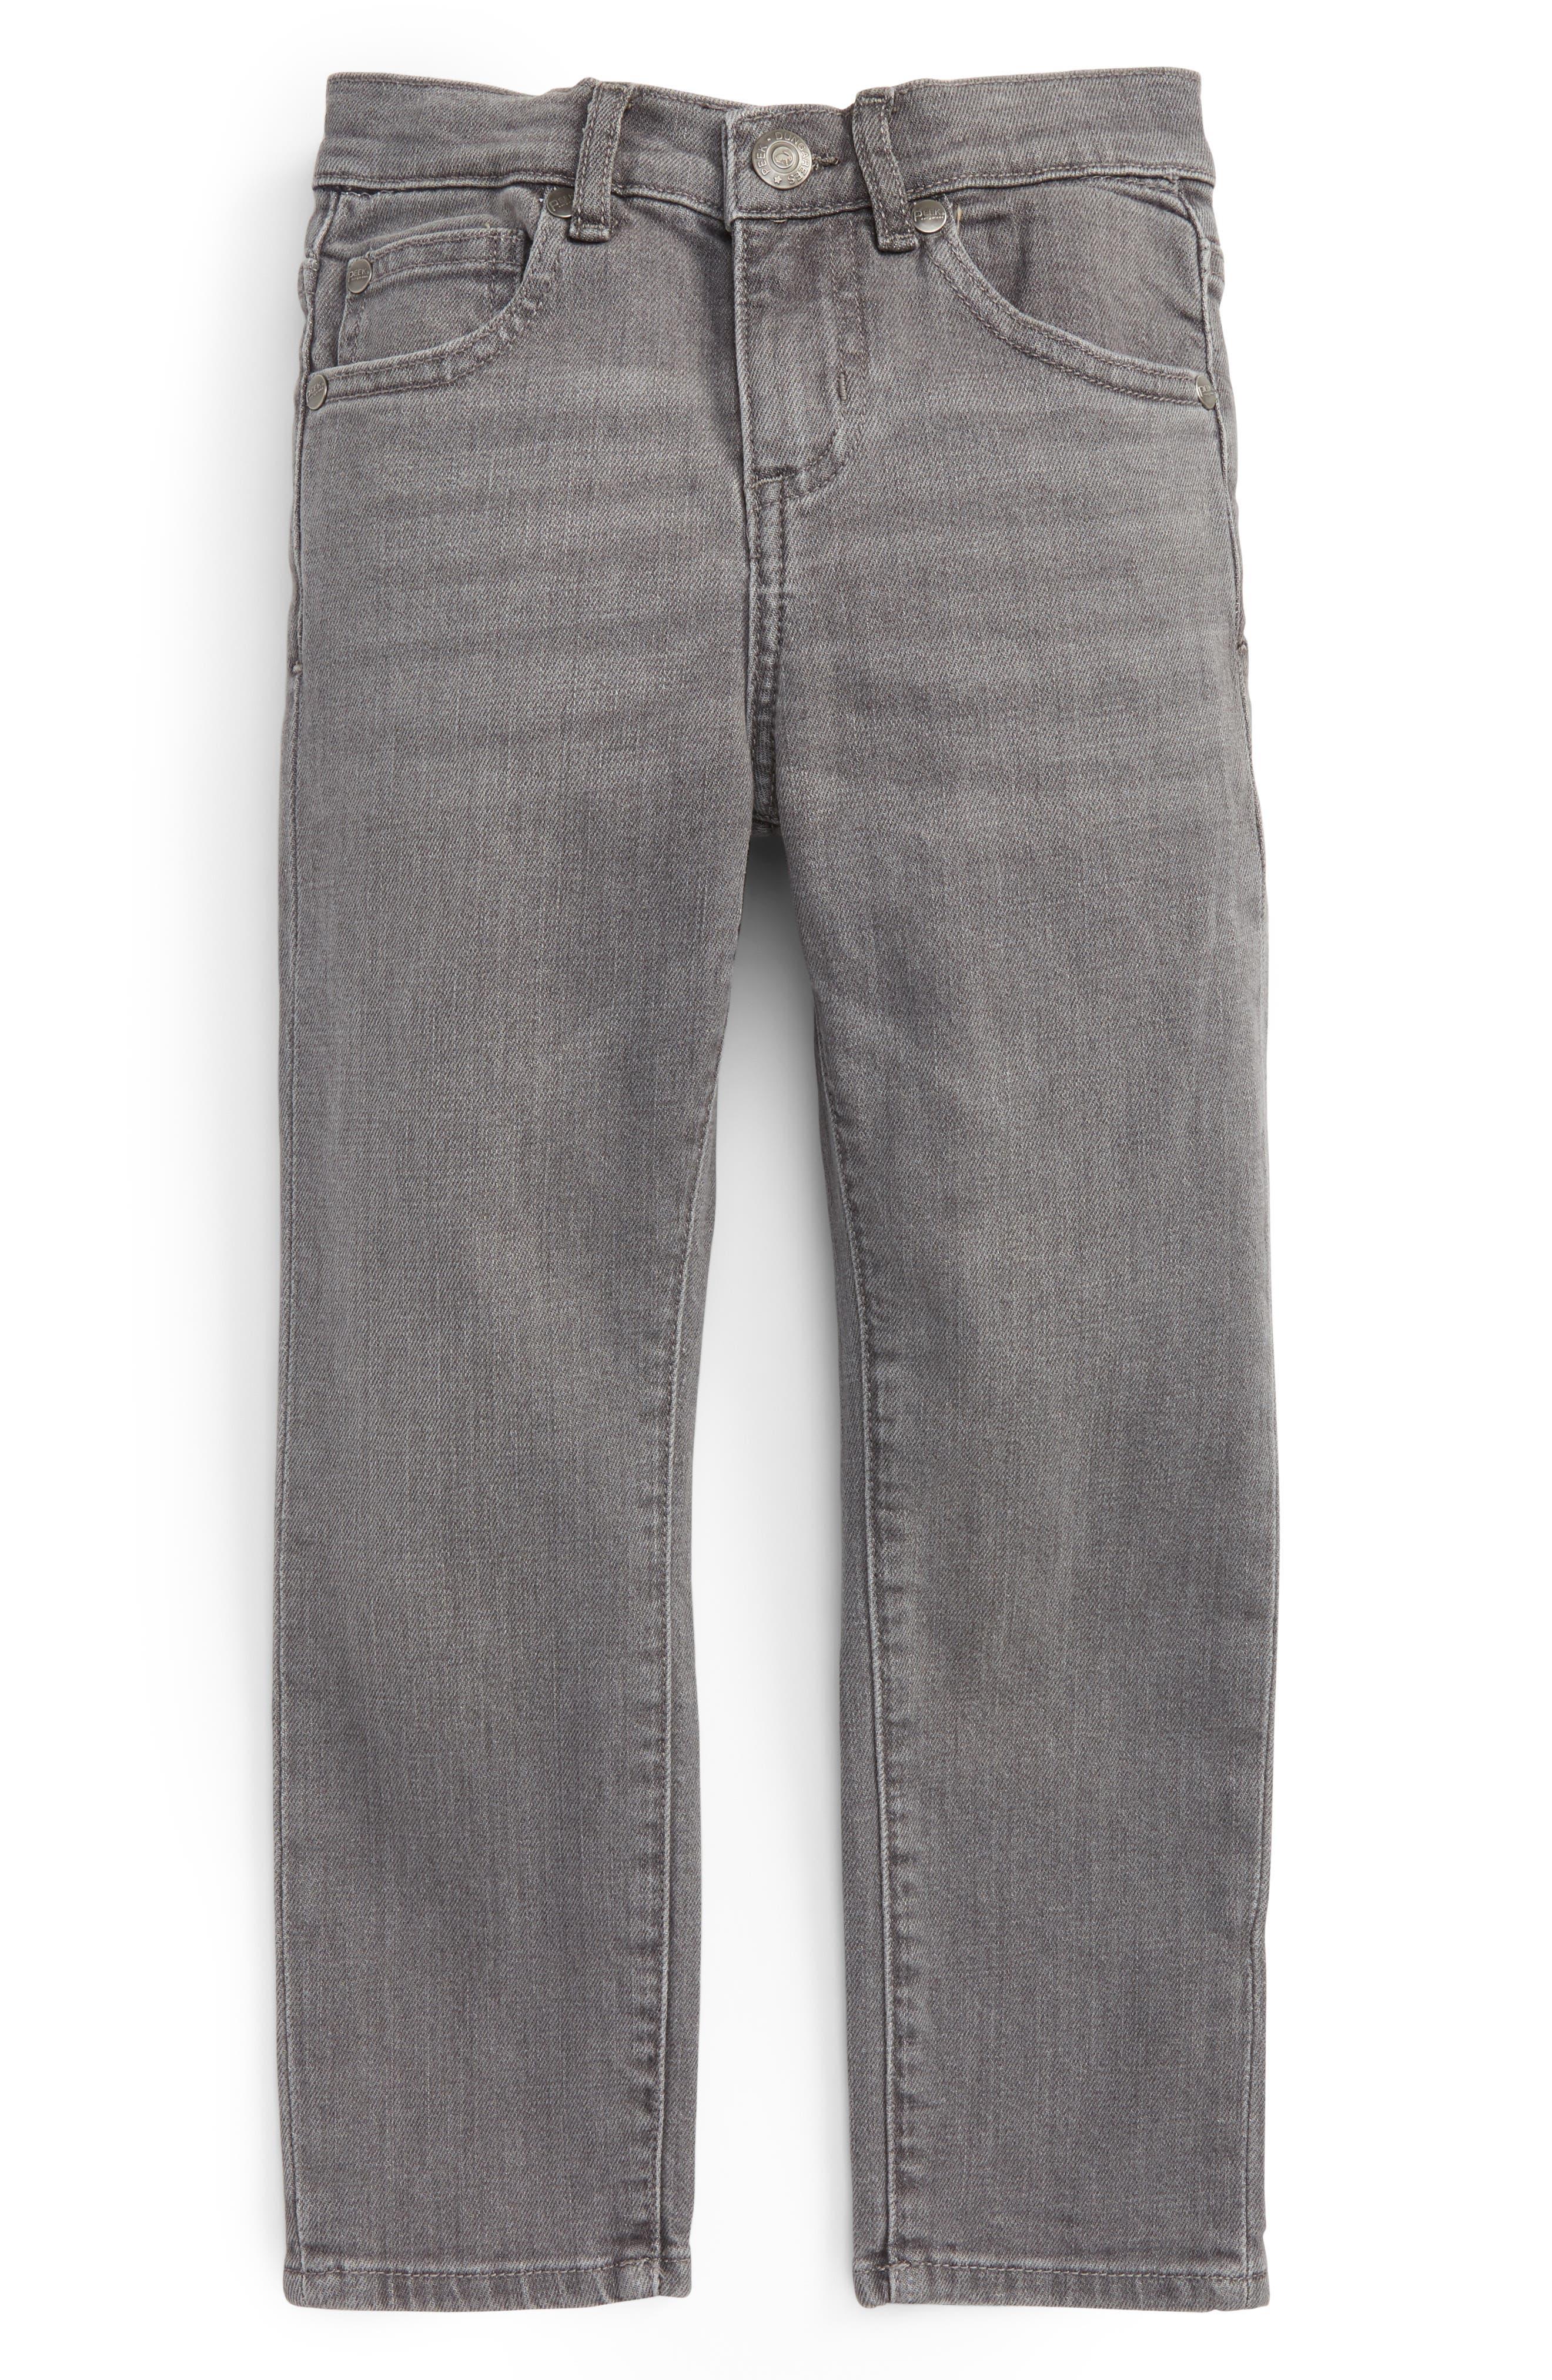 Slouch Jeans,                             Main thumbnail 1, color,                             020